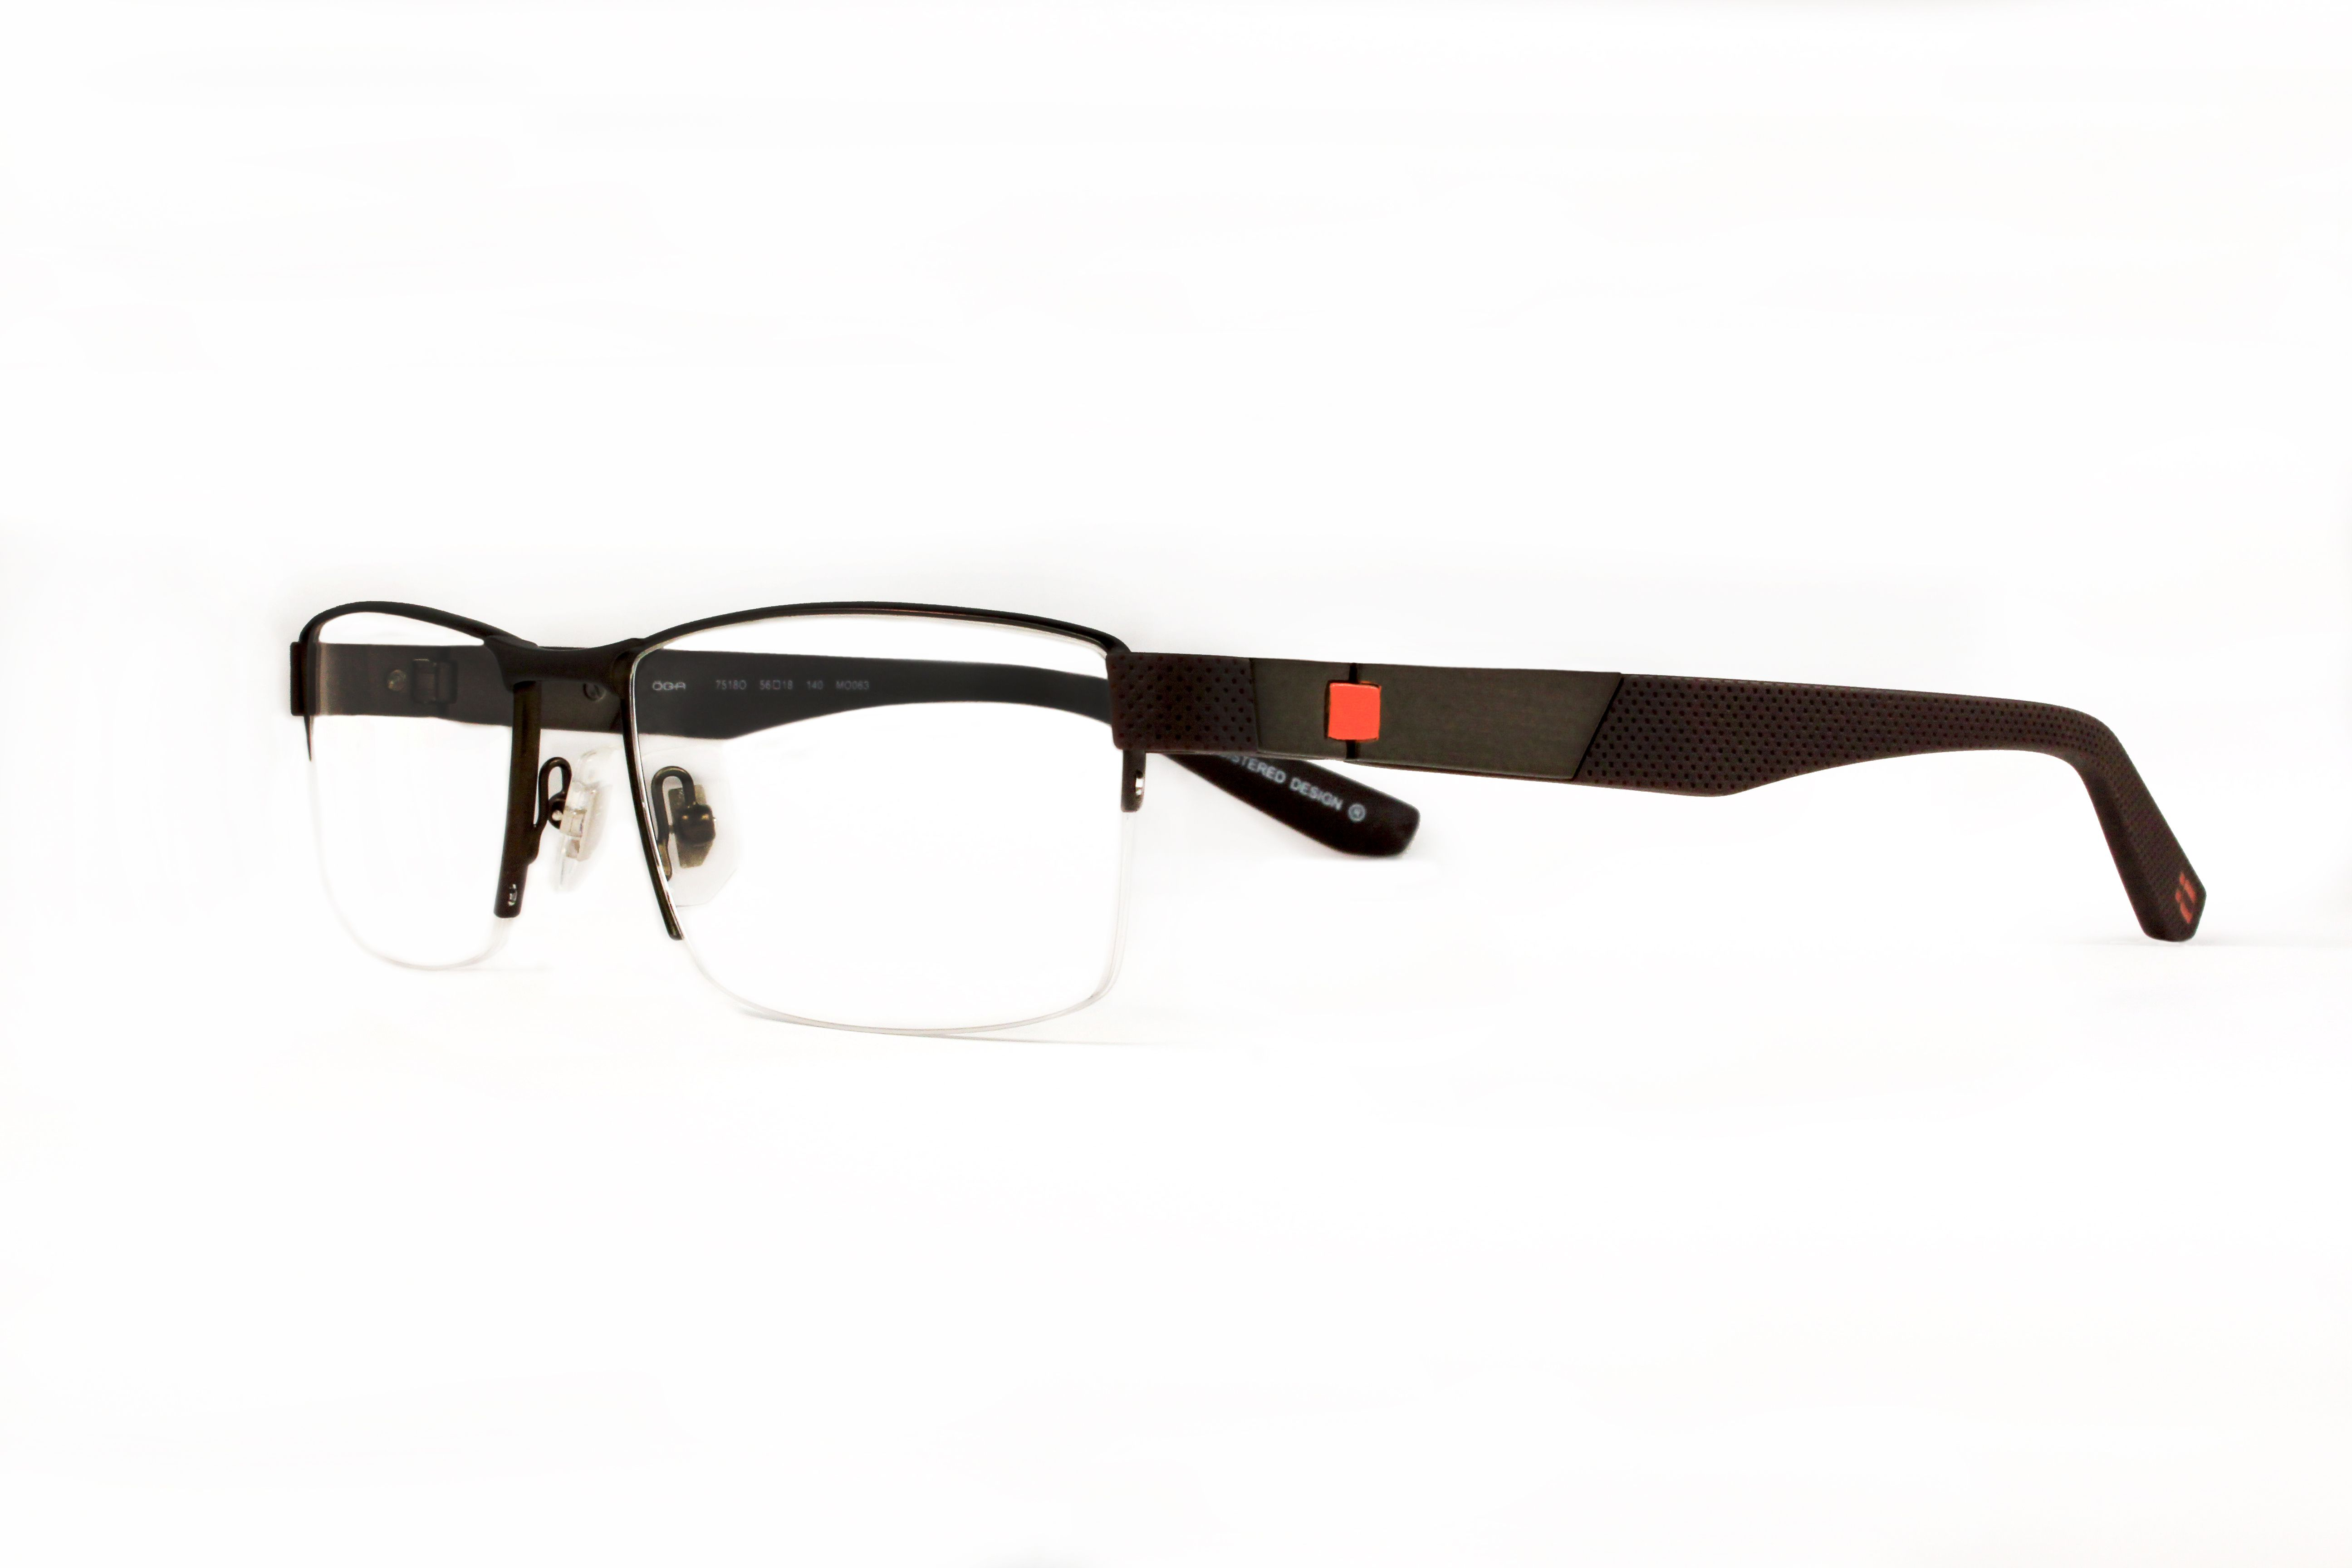 eyeglasses jaguar men women fashionable these eyewear ideas explore more for pin and